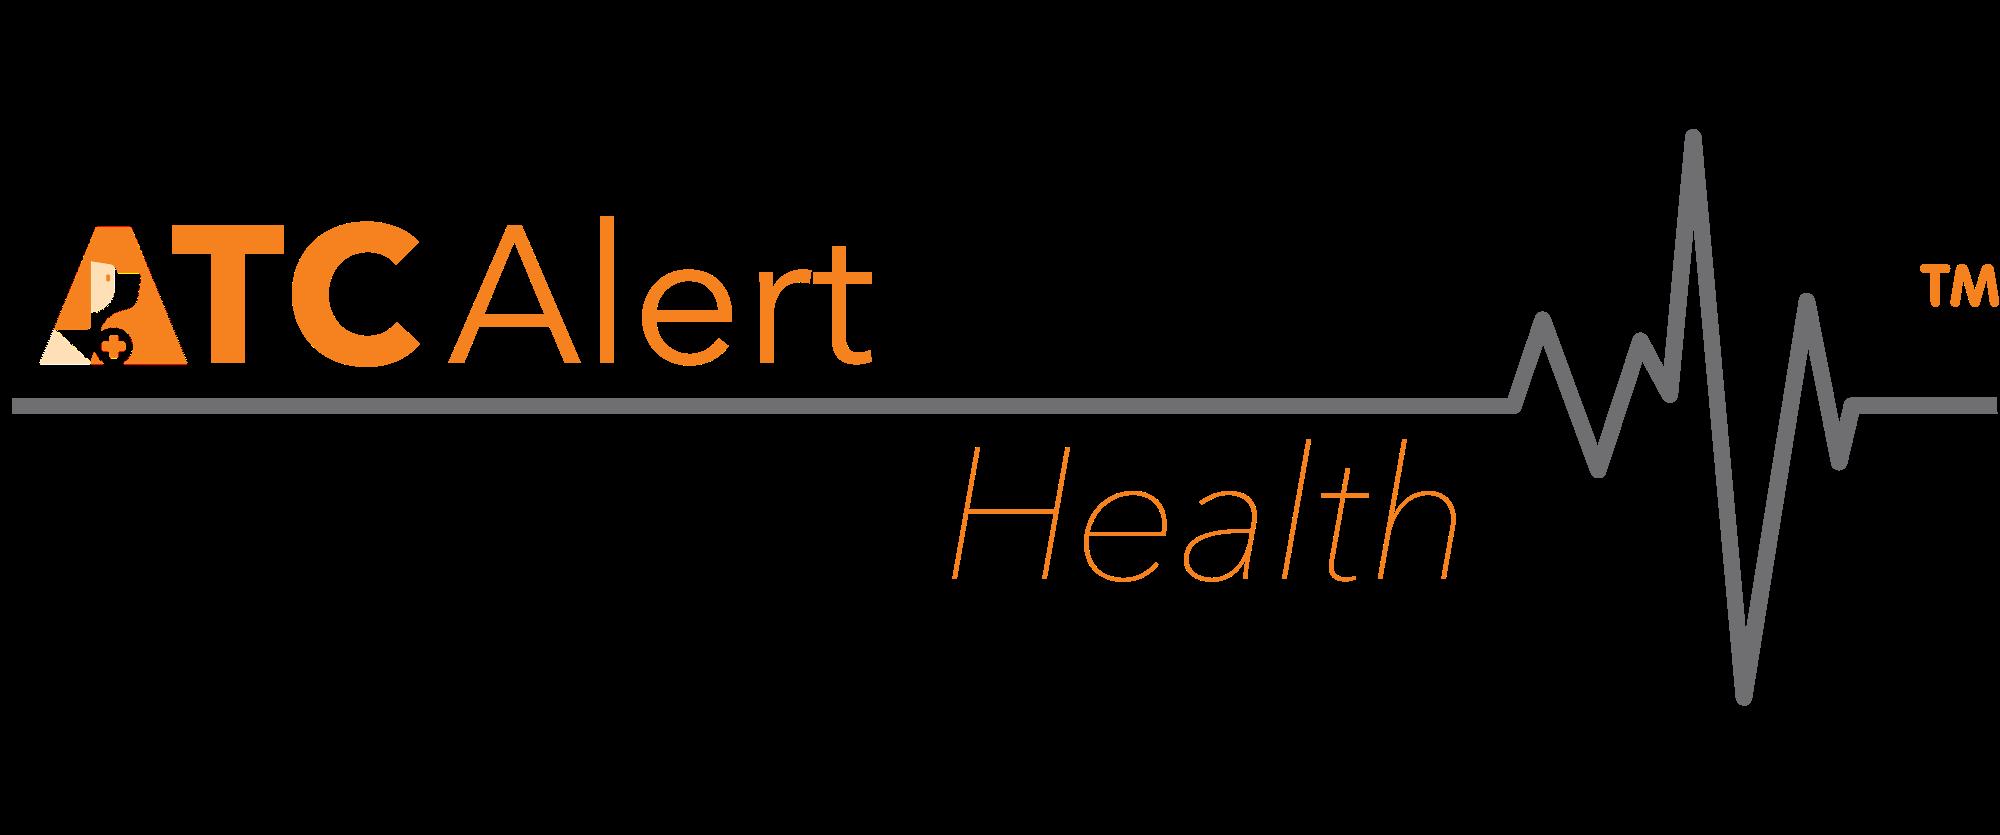 ATC Alert Health Logo